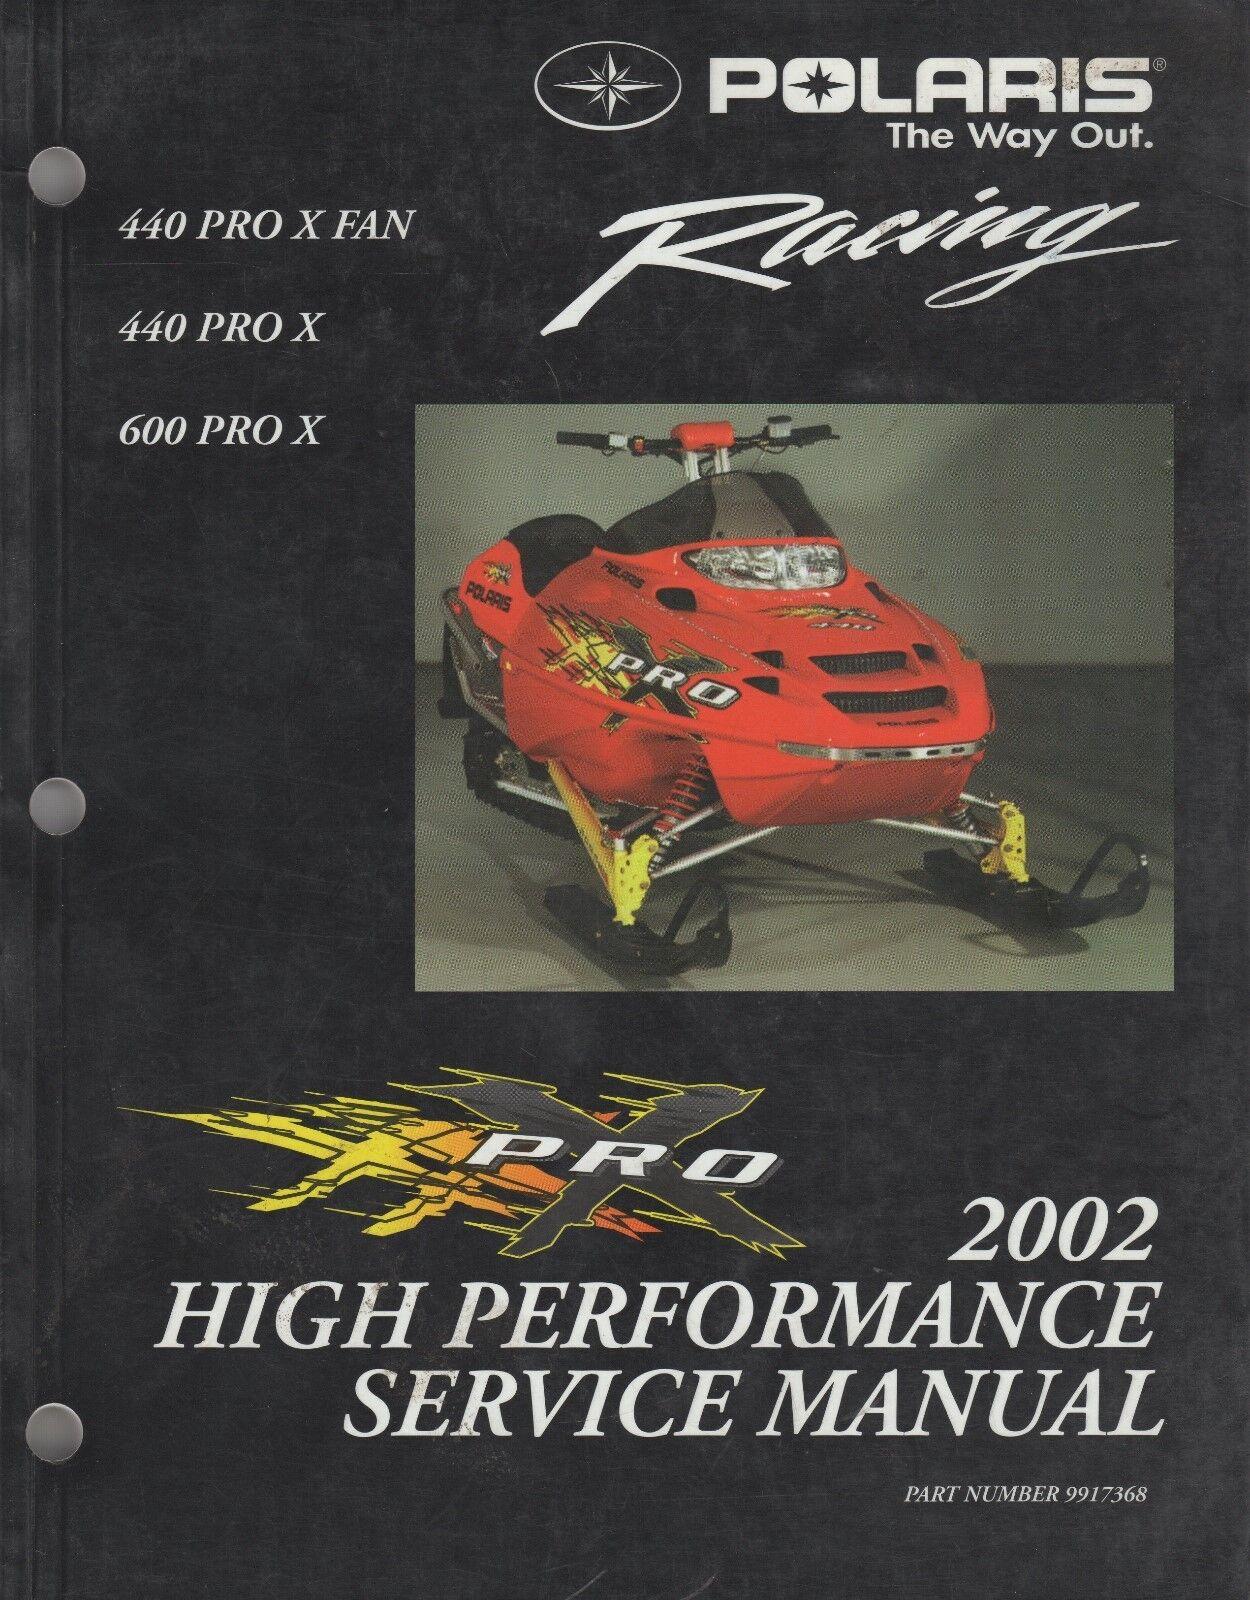 2002 POLARIS  RACING SNOWMOBILE 400 PRO X,600 PRO X SERVICE MANUAL 9917368 (793)